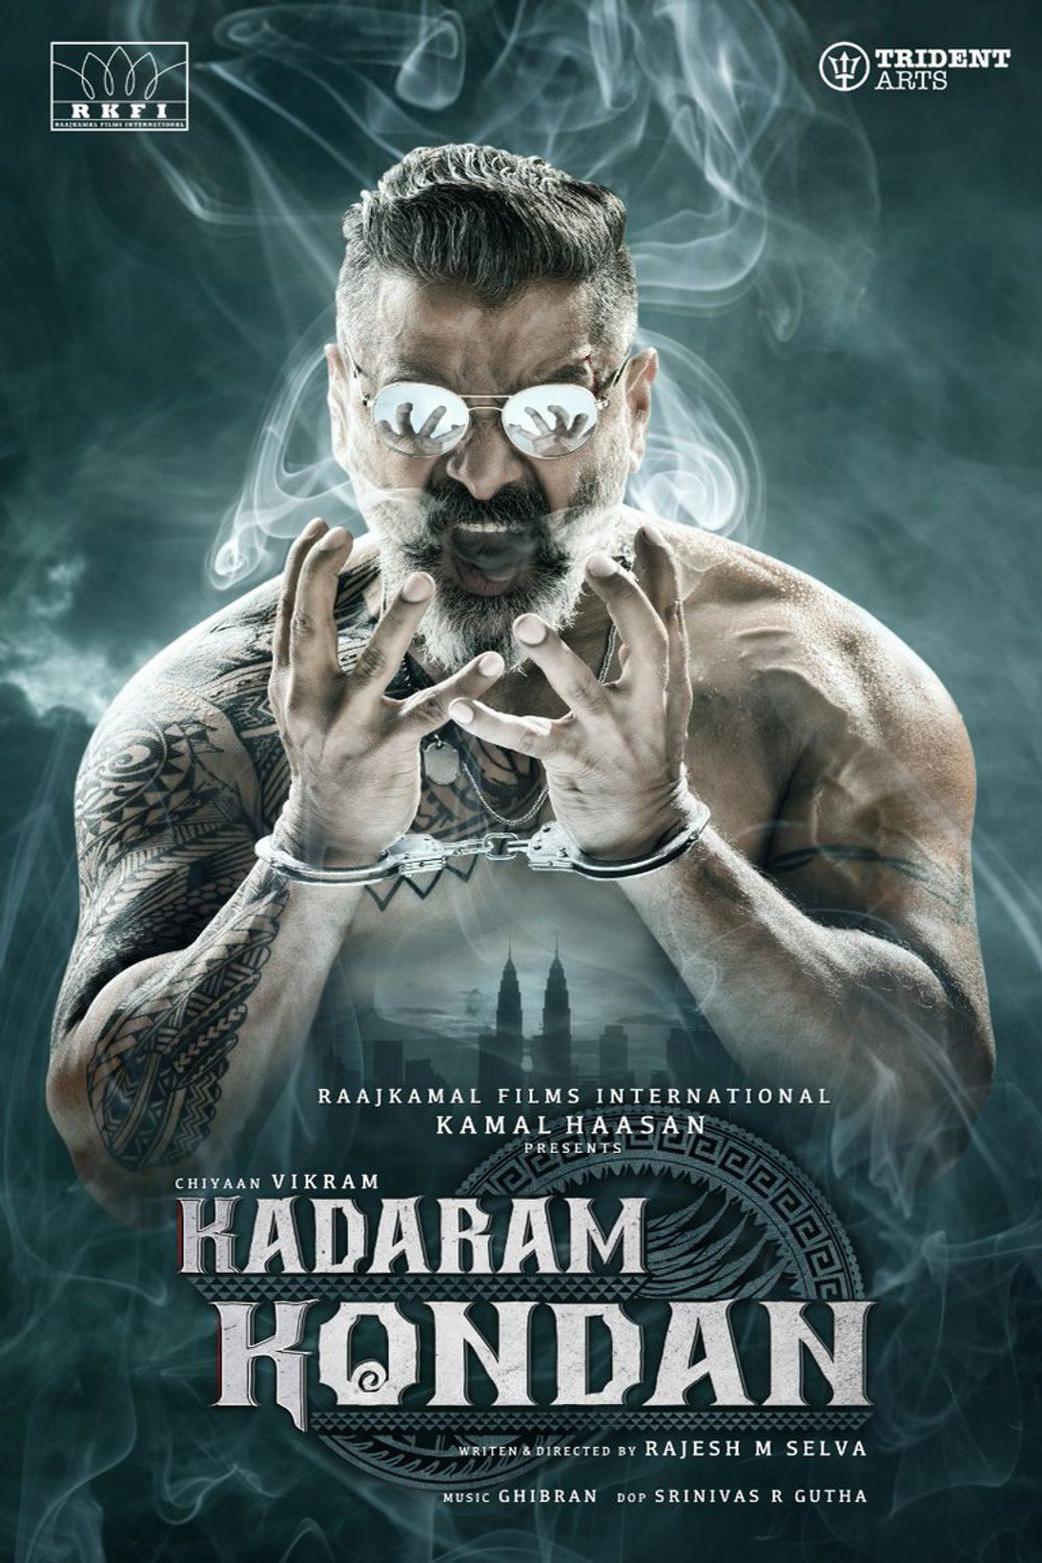 Kadaram Kondan (2021) Hindi Dubbed UNCUT 720p HDRip x264 AAC 800MB Download